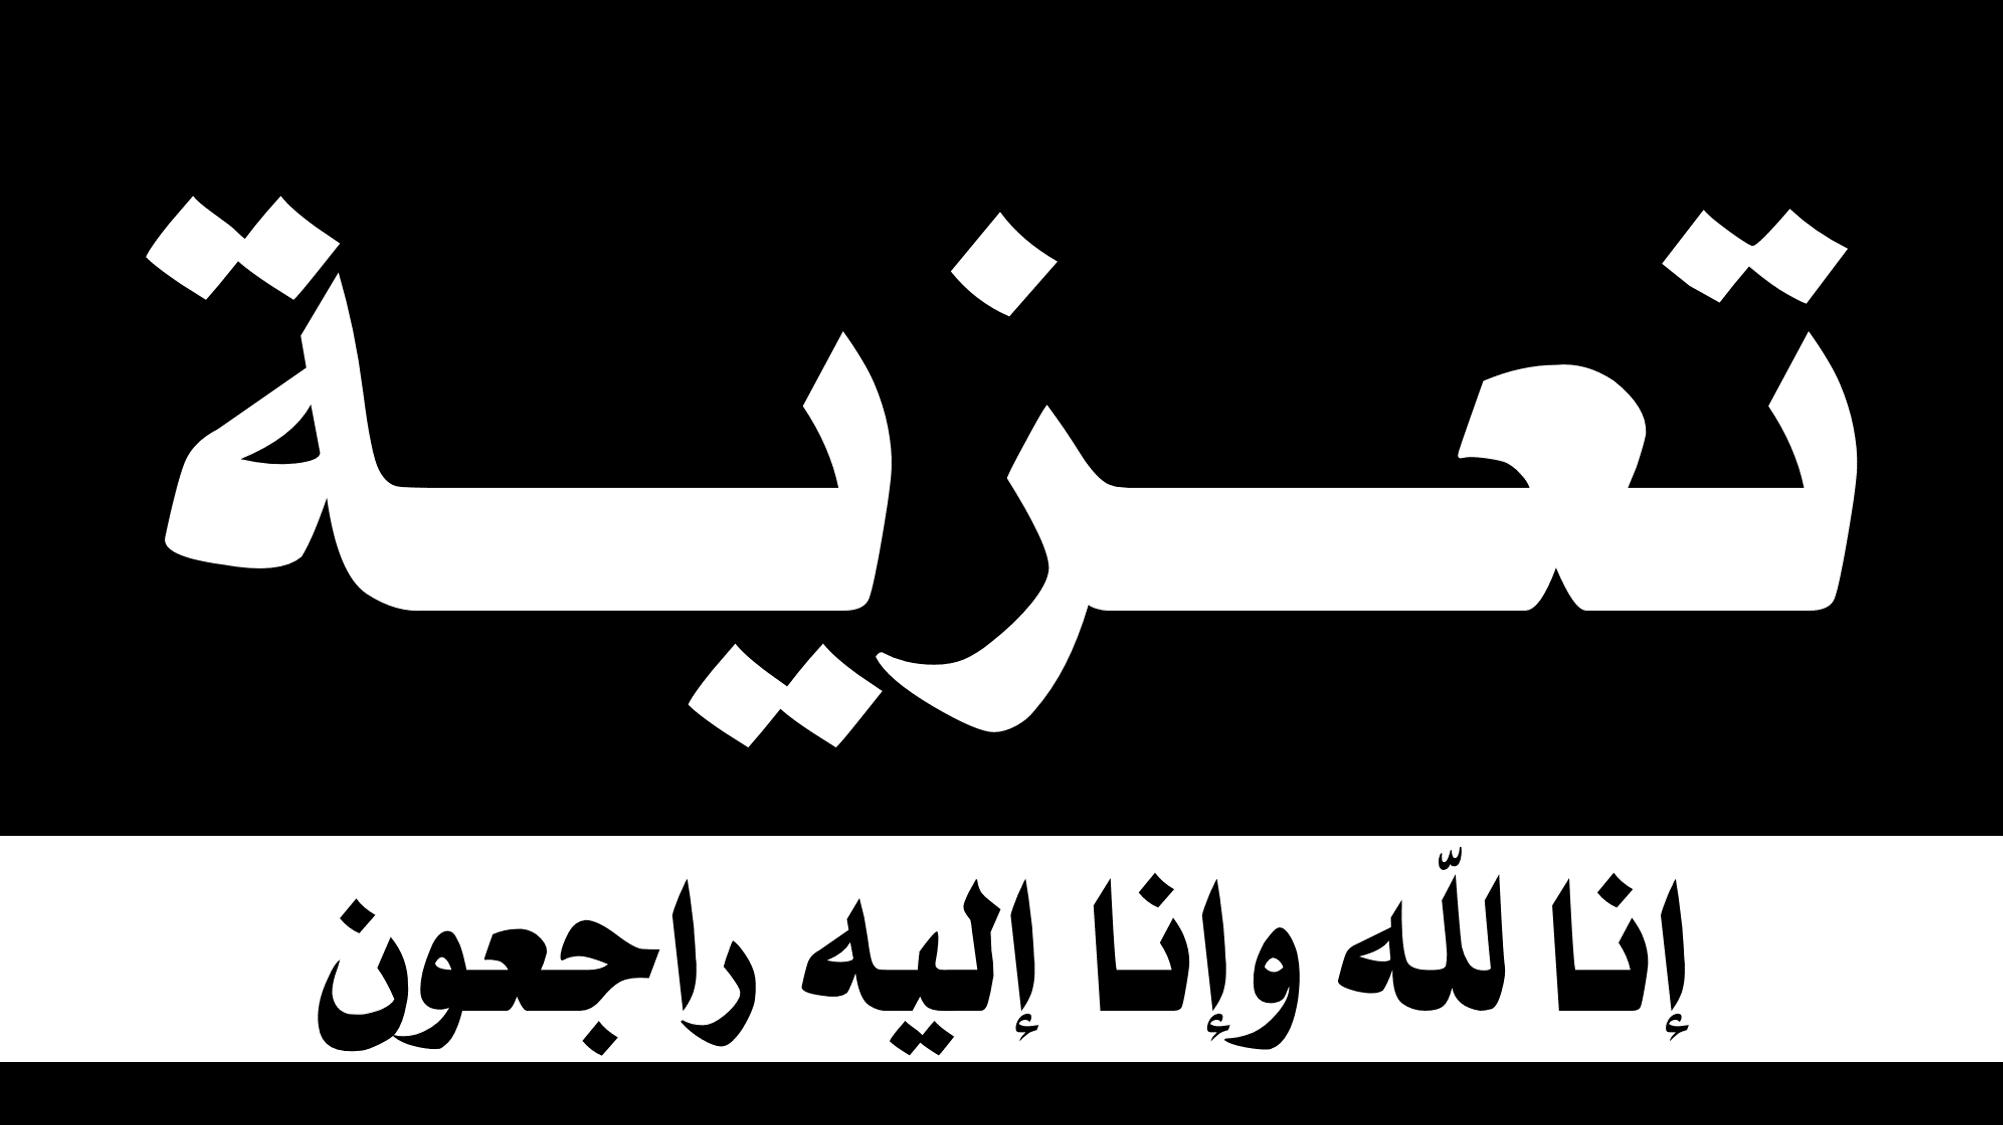 Photo of المغازي وفرقها الرياضية وجماهيرها تعزي نجمها بوفاة والده